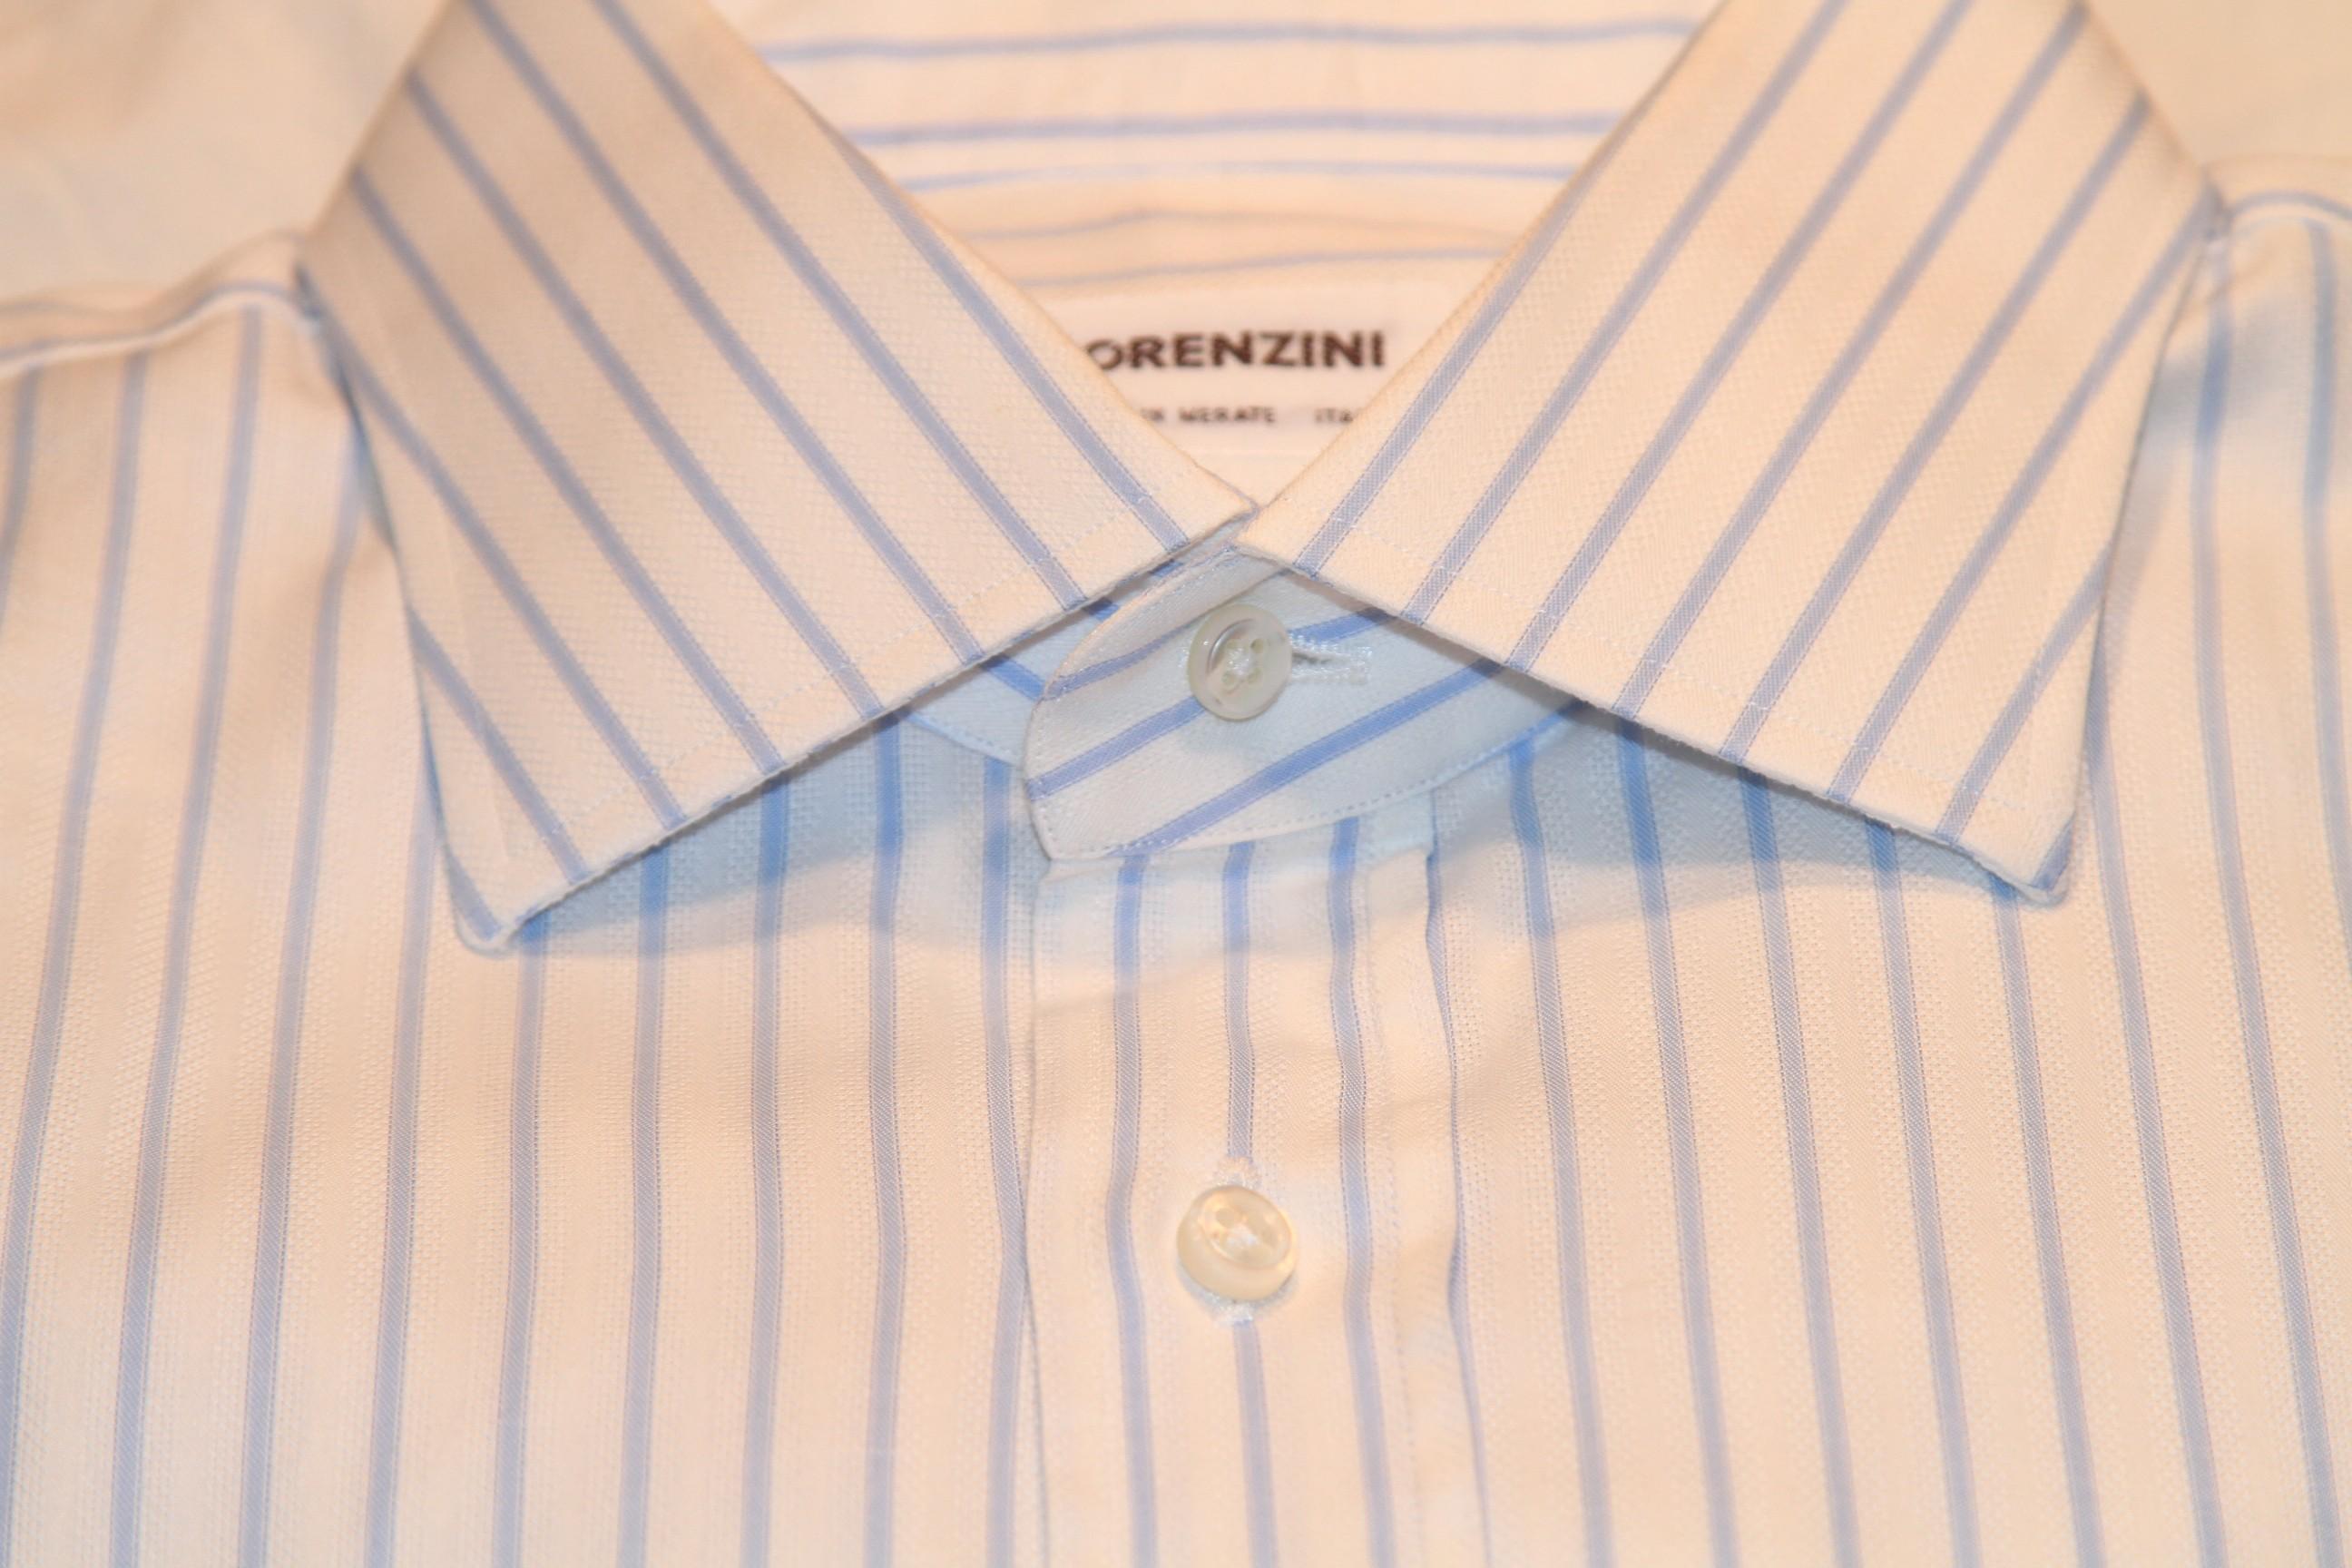 #22 - Lorenzini 41/16 White with Light Blue Stripe (very soft shirt)